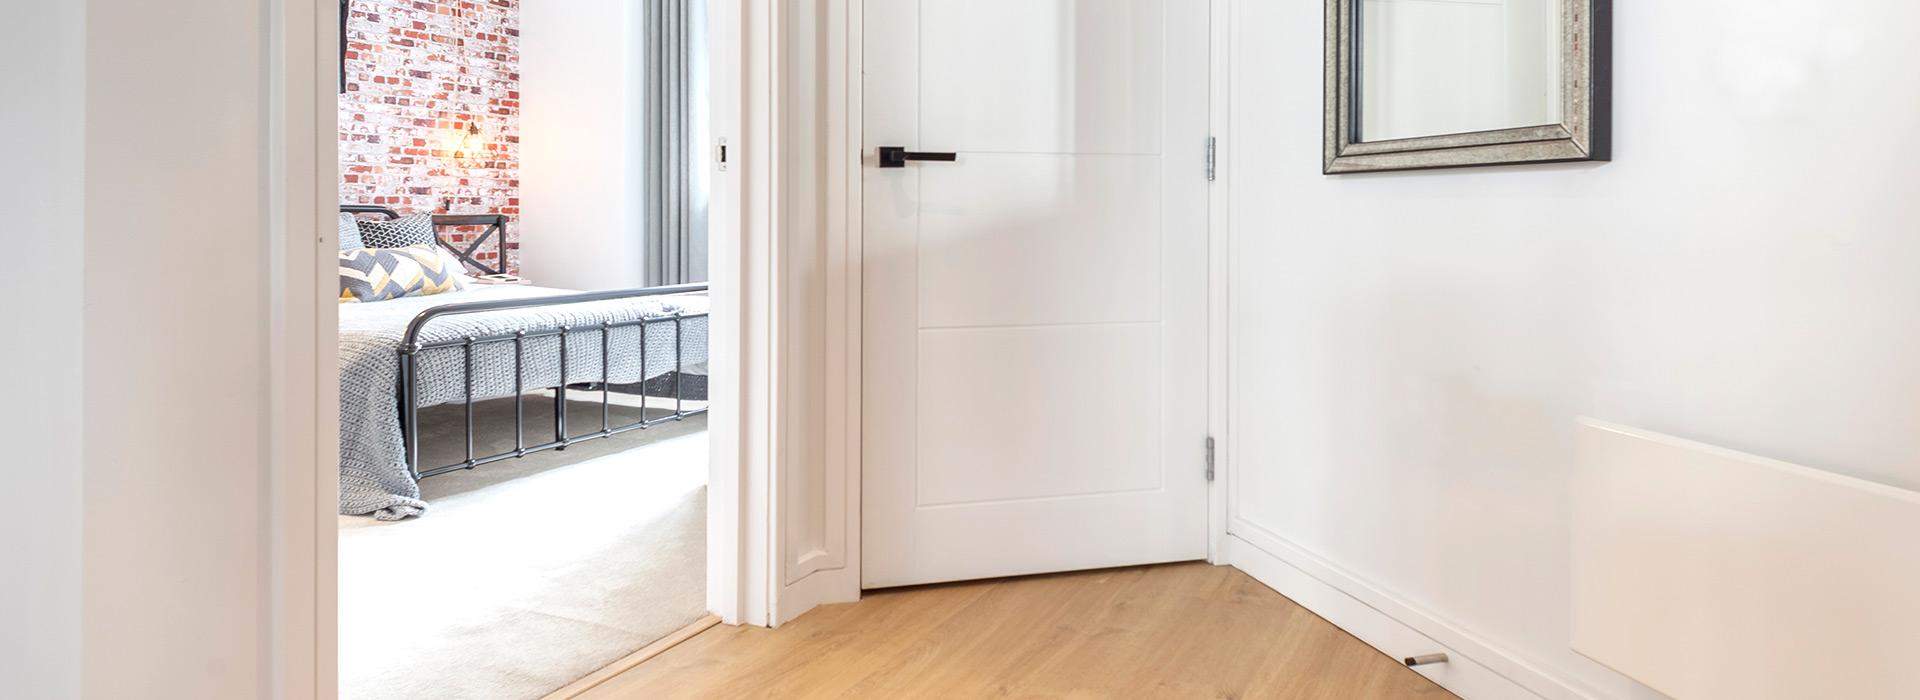 Arista internal doors